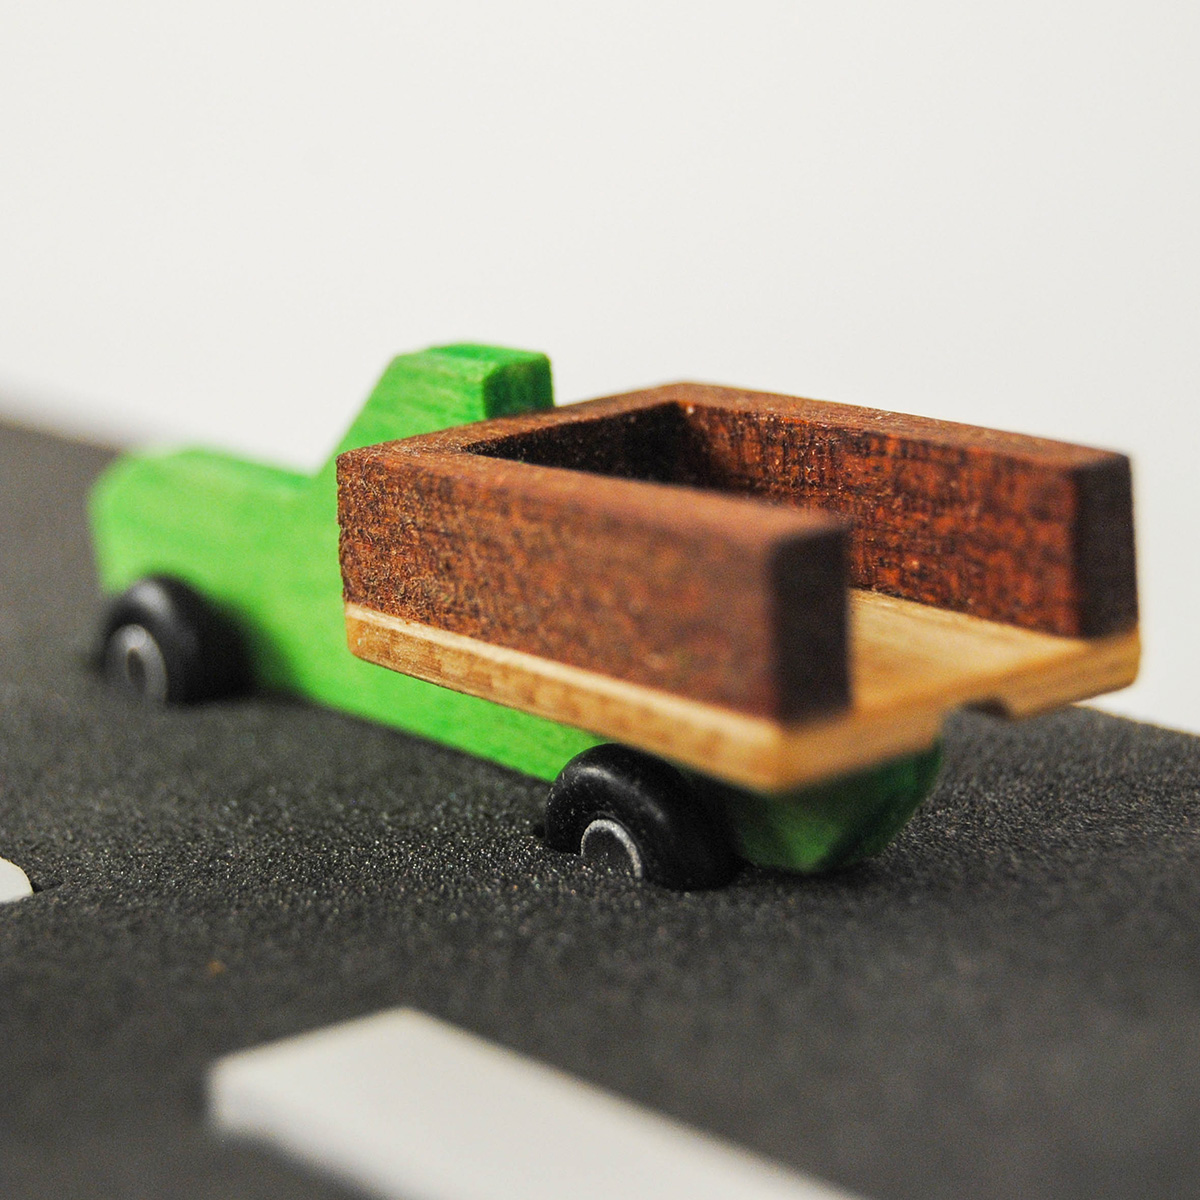 macchinina-legno-toy-wood-green-design